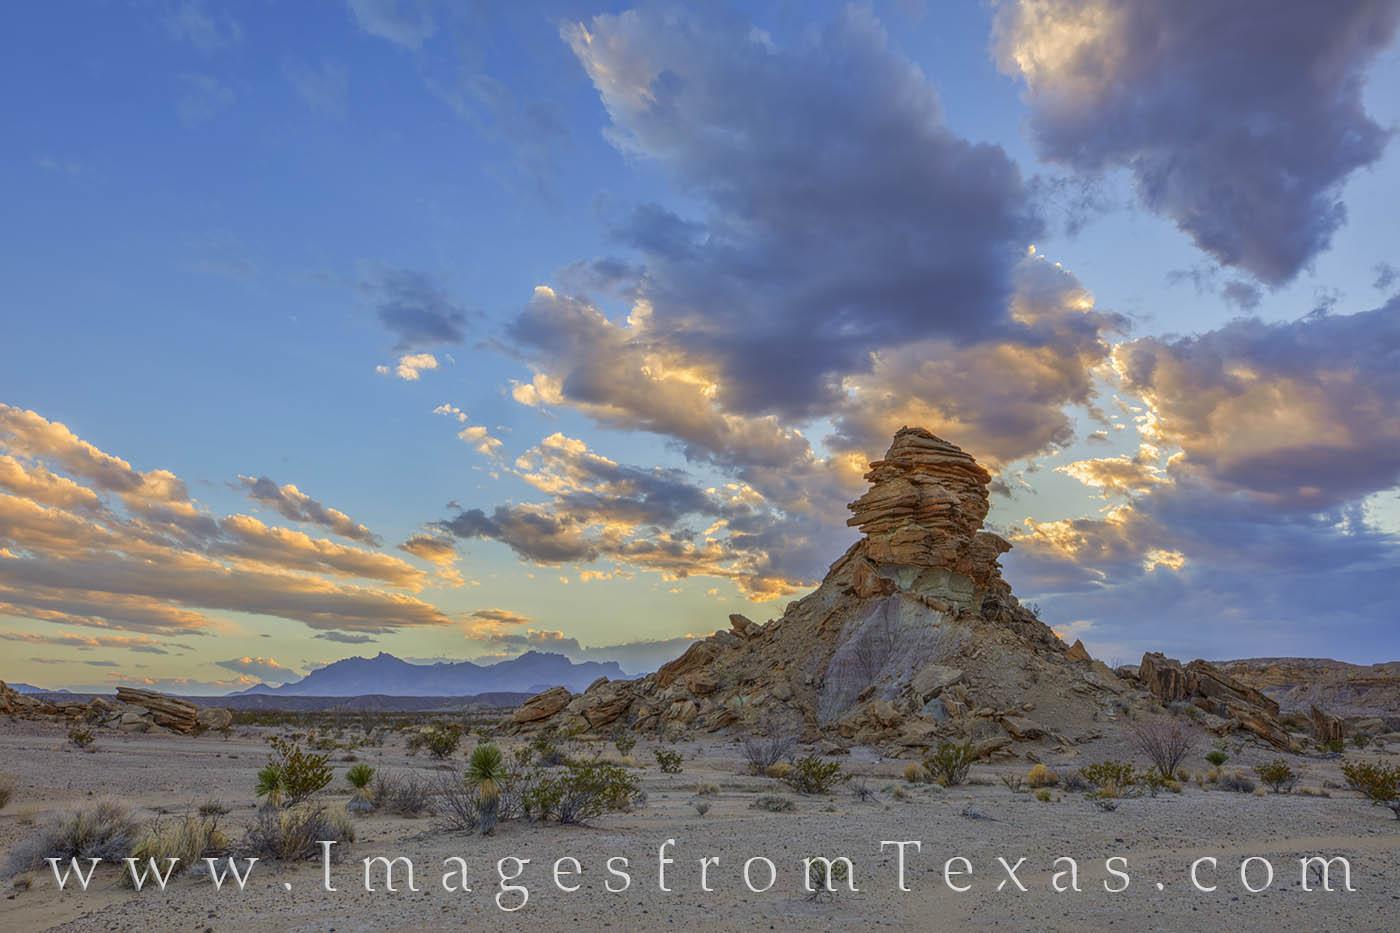 big bend, hoodoos, tornillo flats, chisos mountains, chihuahuan desert, sunset, big bend prints, texas national parks, sunset, photo